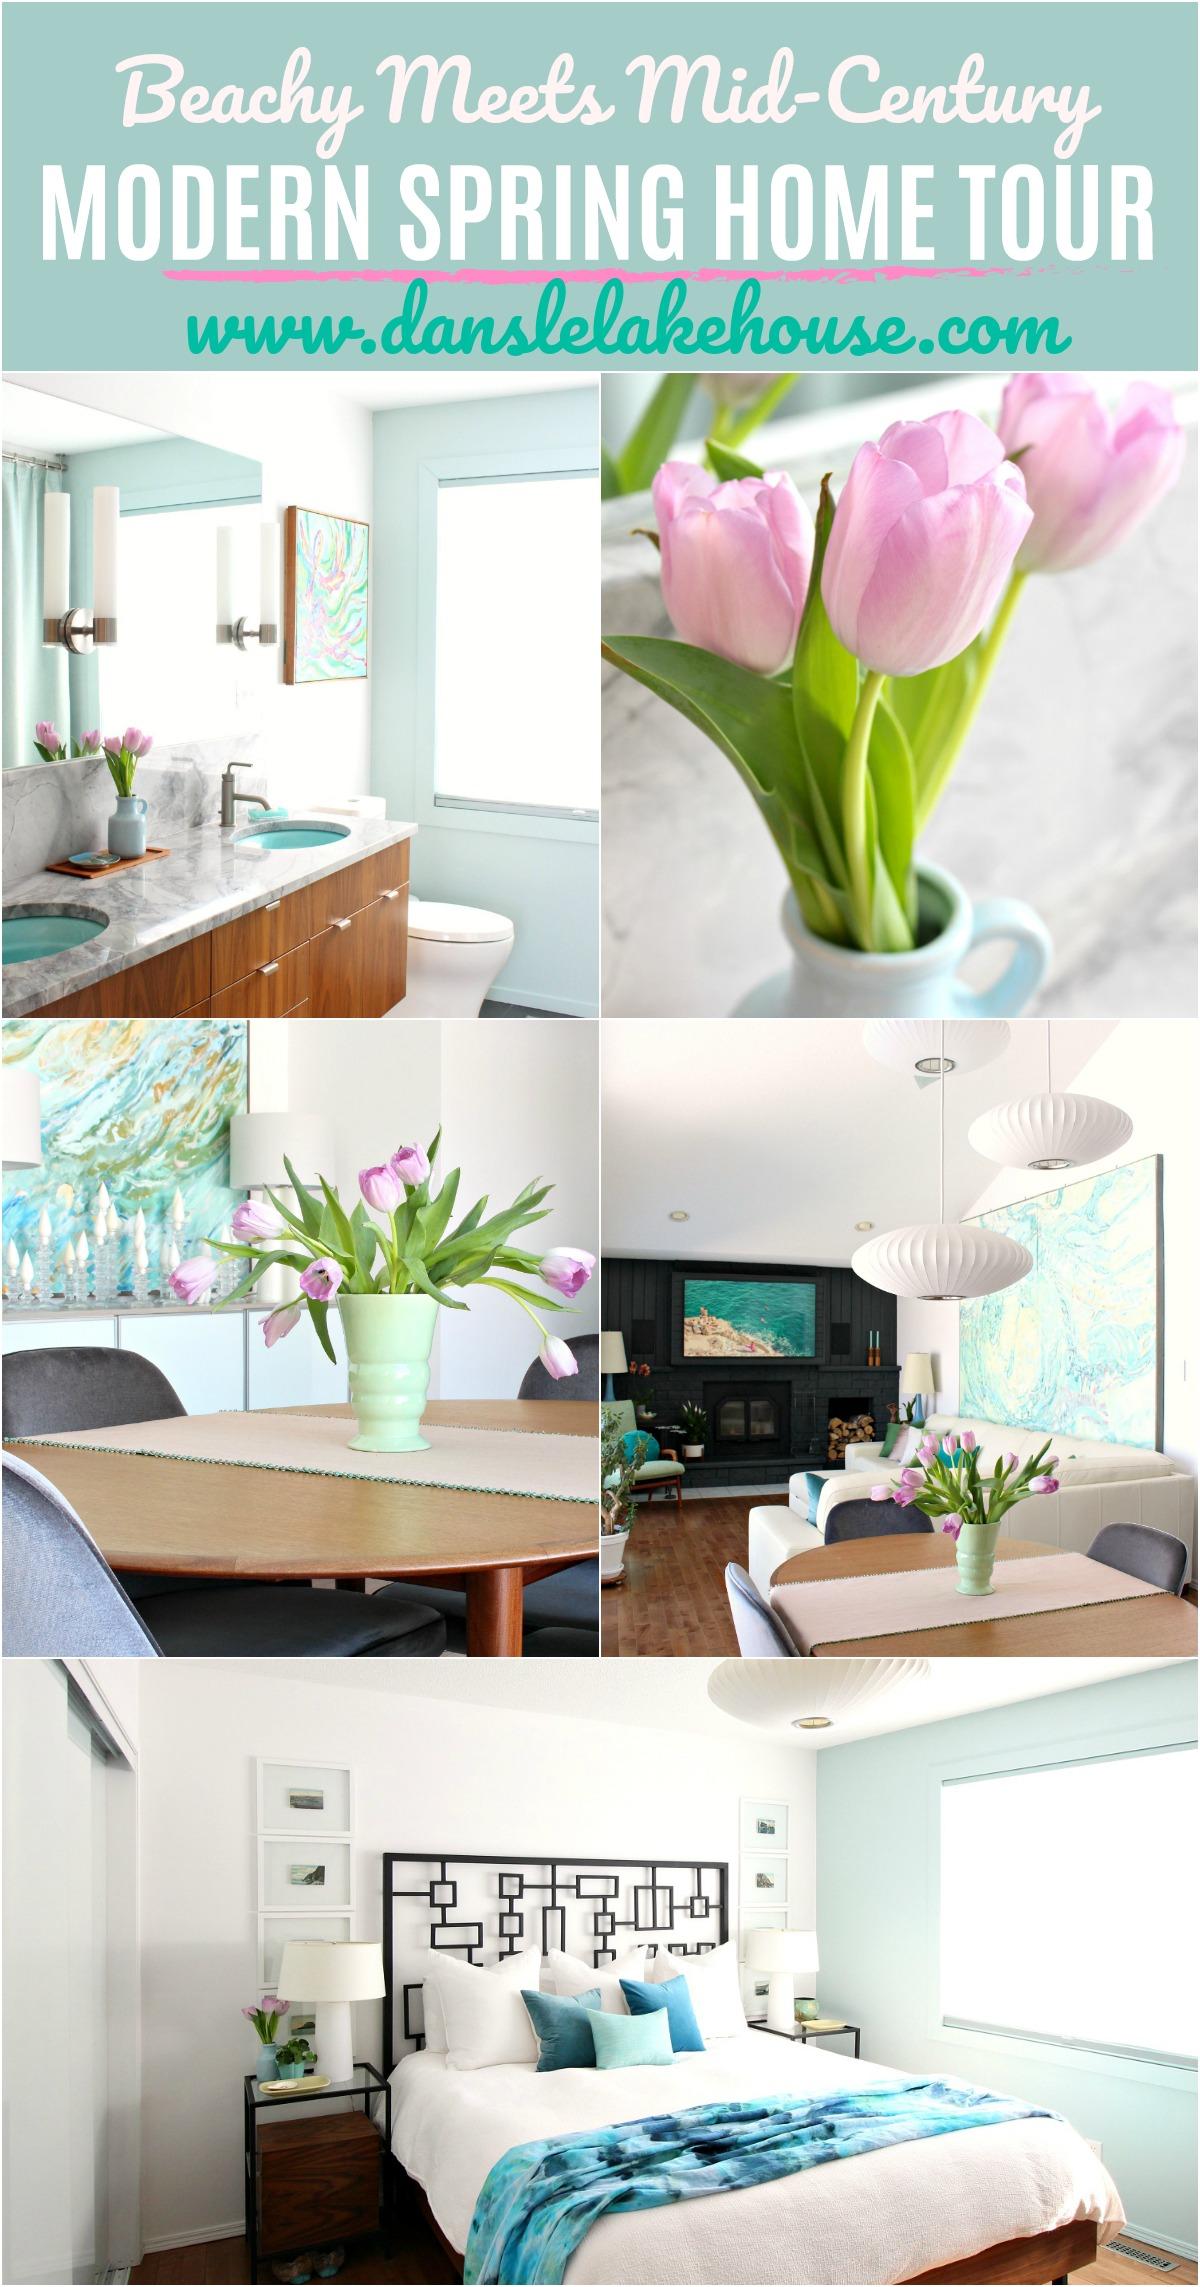 Beachy Meets Mid-Century Modern Spring Home Tour Blog Hop. TONS of Easy and Affordable Spring Decor Ideas. #springdecor #homedecor #moderncoastal #beachy #beachhouse